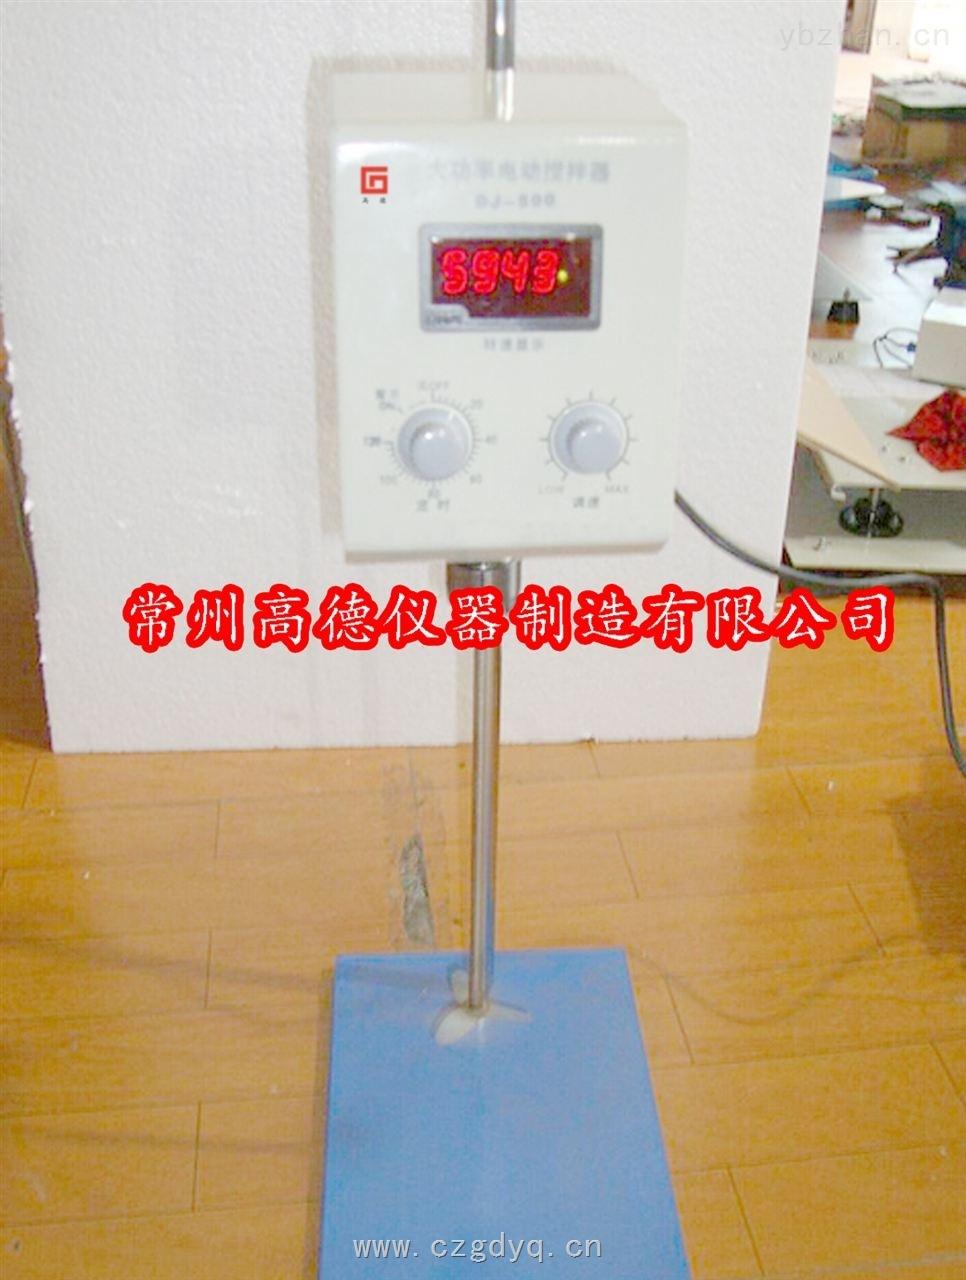 DJ-500-大功率數顯電動攪拌器